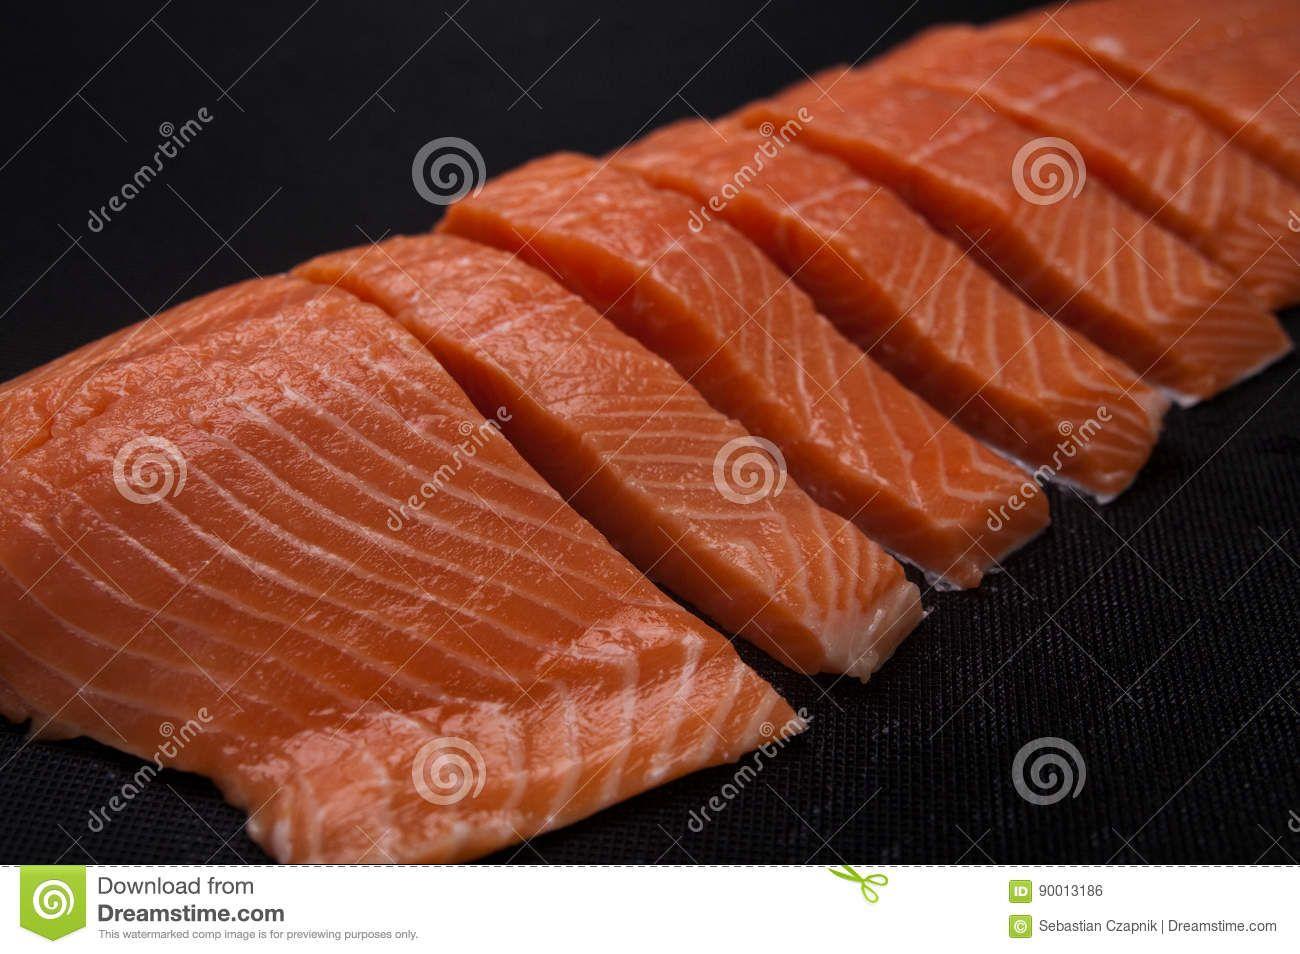 Pin By Sebastian On Fish Processing Factory Food Photo Food Salmon